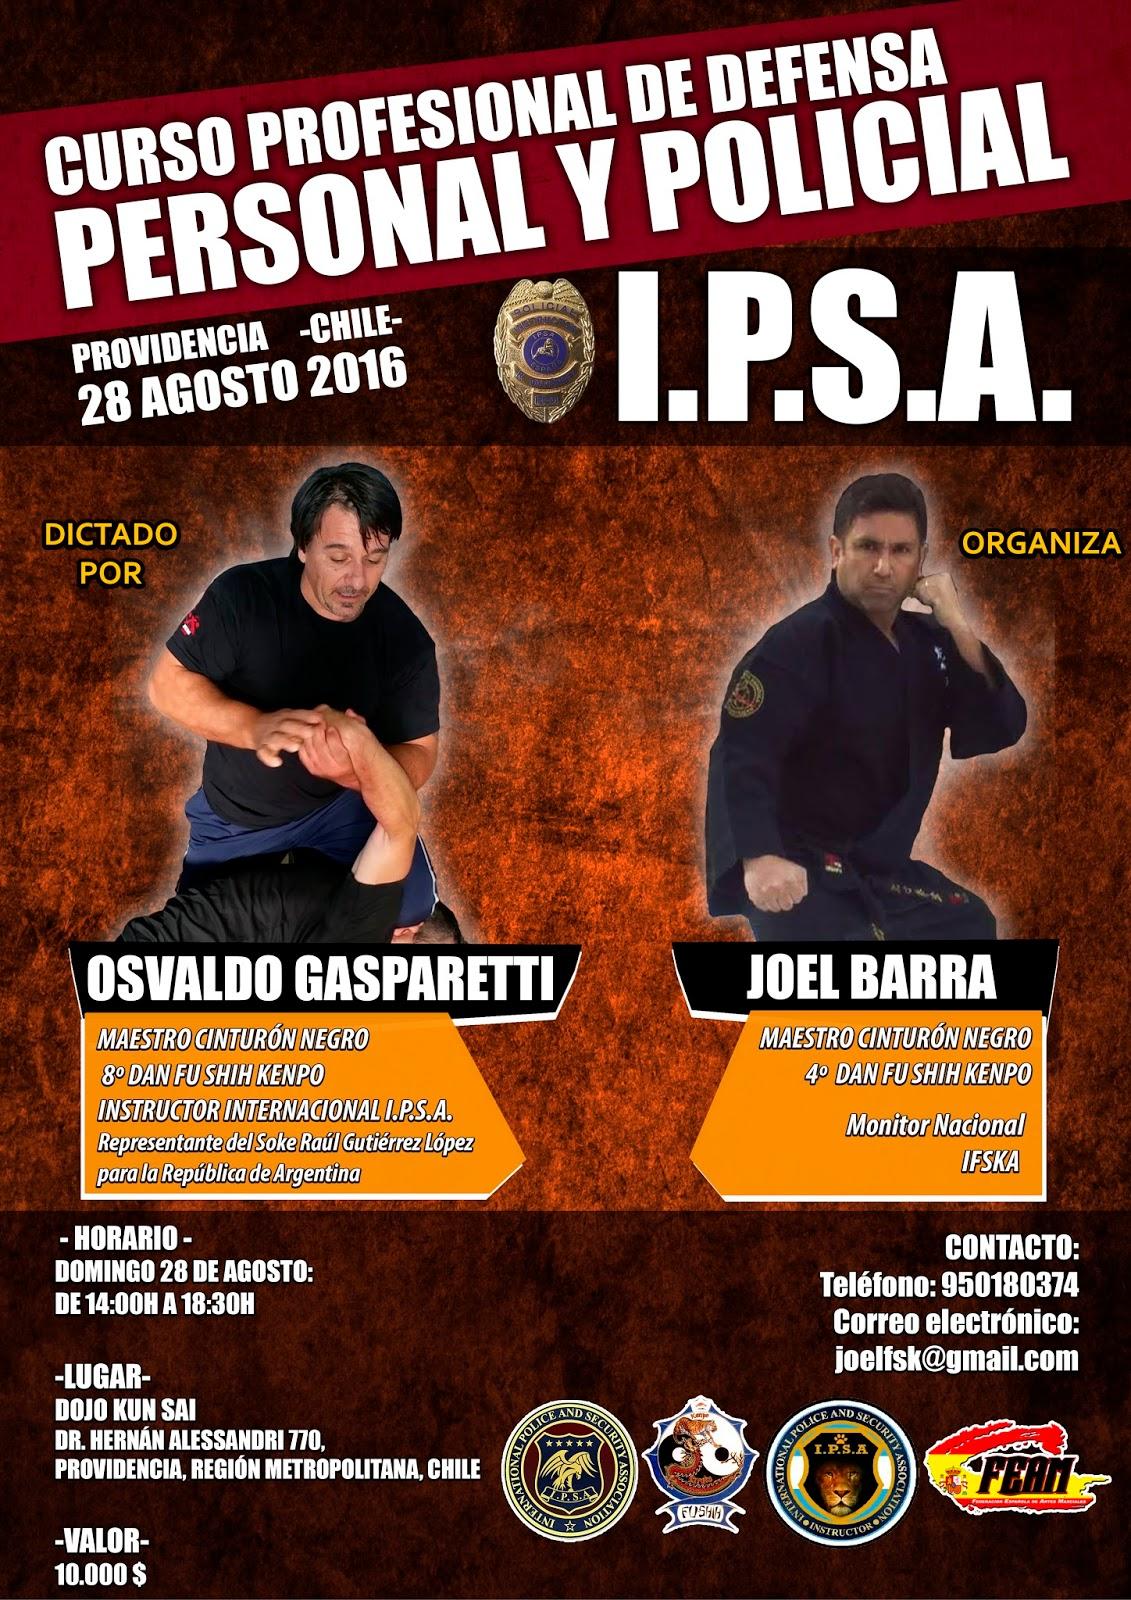 IPSA DEFENSA PERSONAL POLICIAL CURSO I.P.S.A. SEMINARIO GUARDIA CIVIL POLICIA MILITAR PENITENCIARIA SEGURIDAD ASOCIACION INTERNACIONAL IPSA INTERNATIONAL POLICE AND SECURITY ASSOCIATION IPSA INTERNACIONAL CURSOS SEMINARIOS